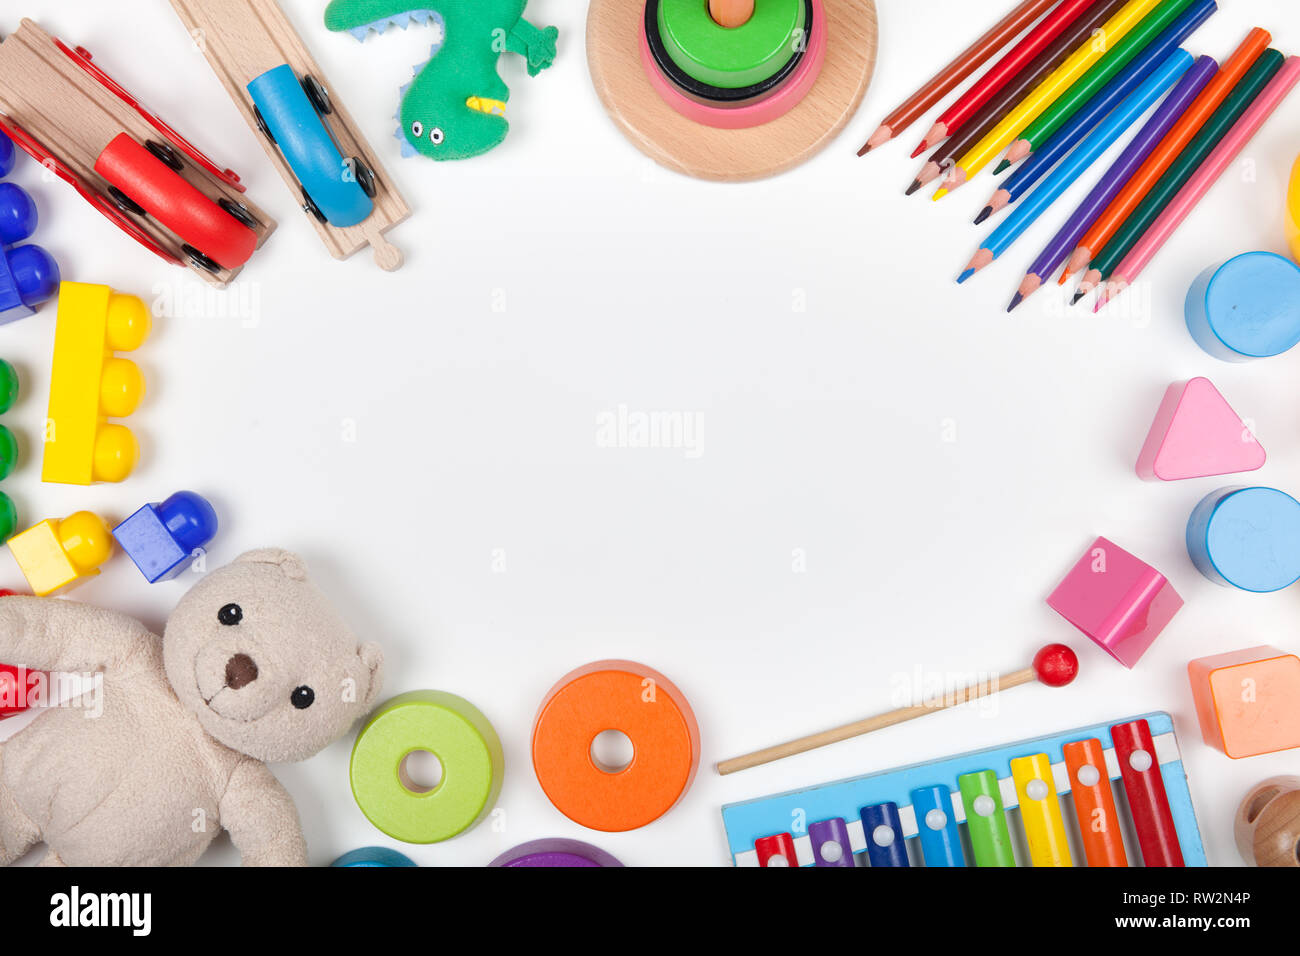 78+ Gambar Babi Pensil HD